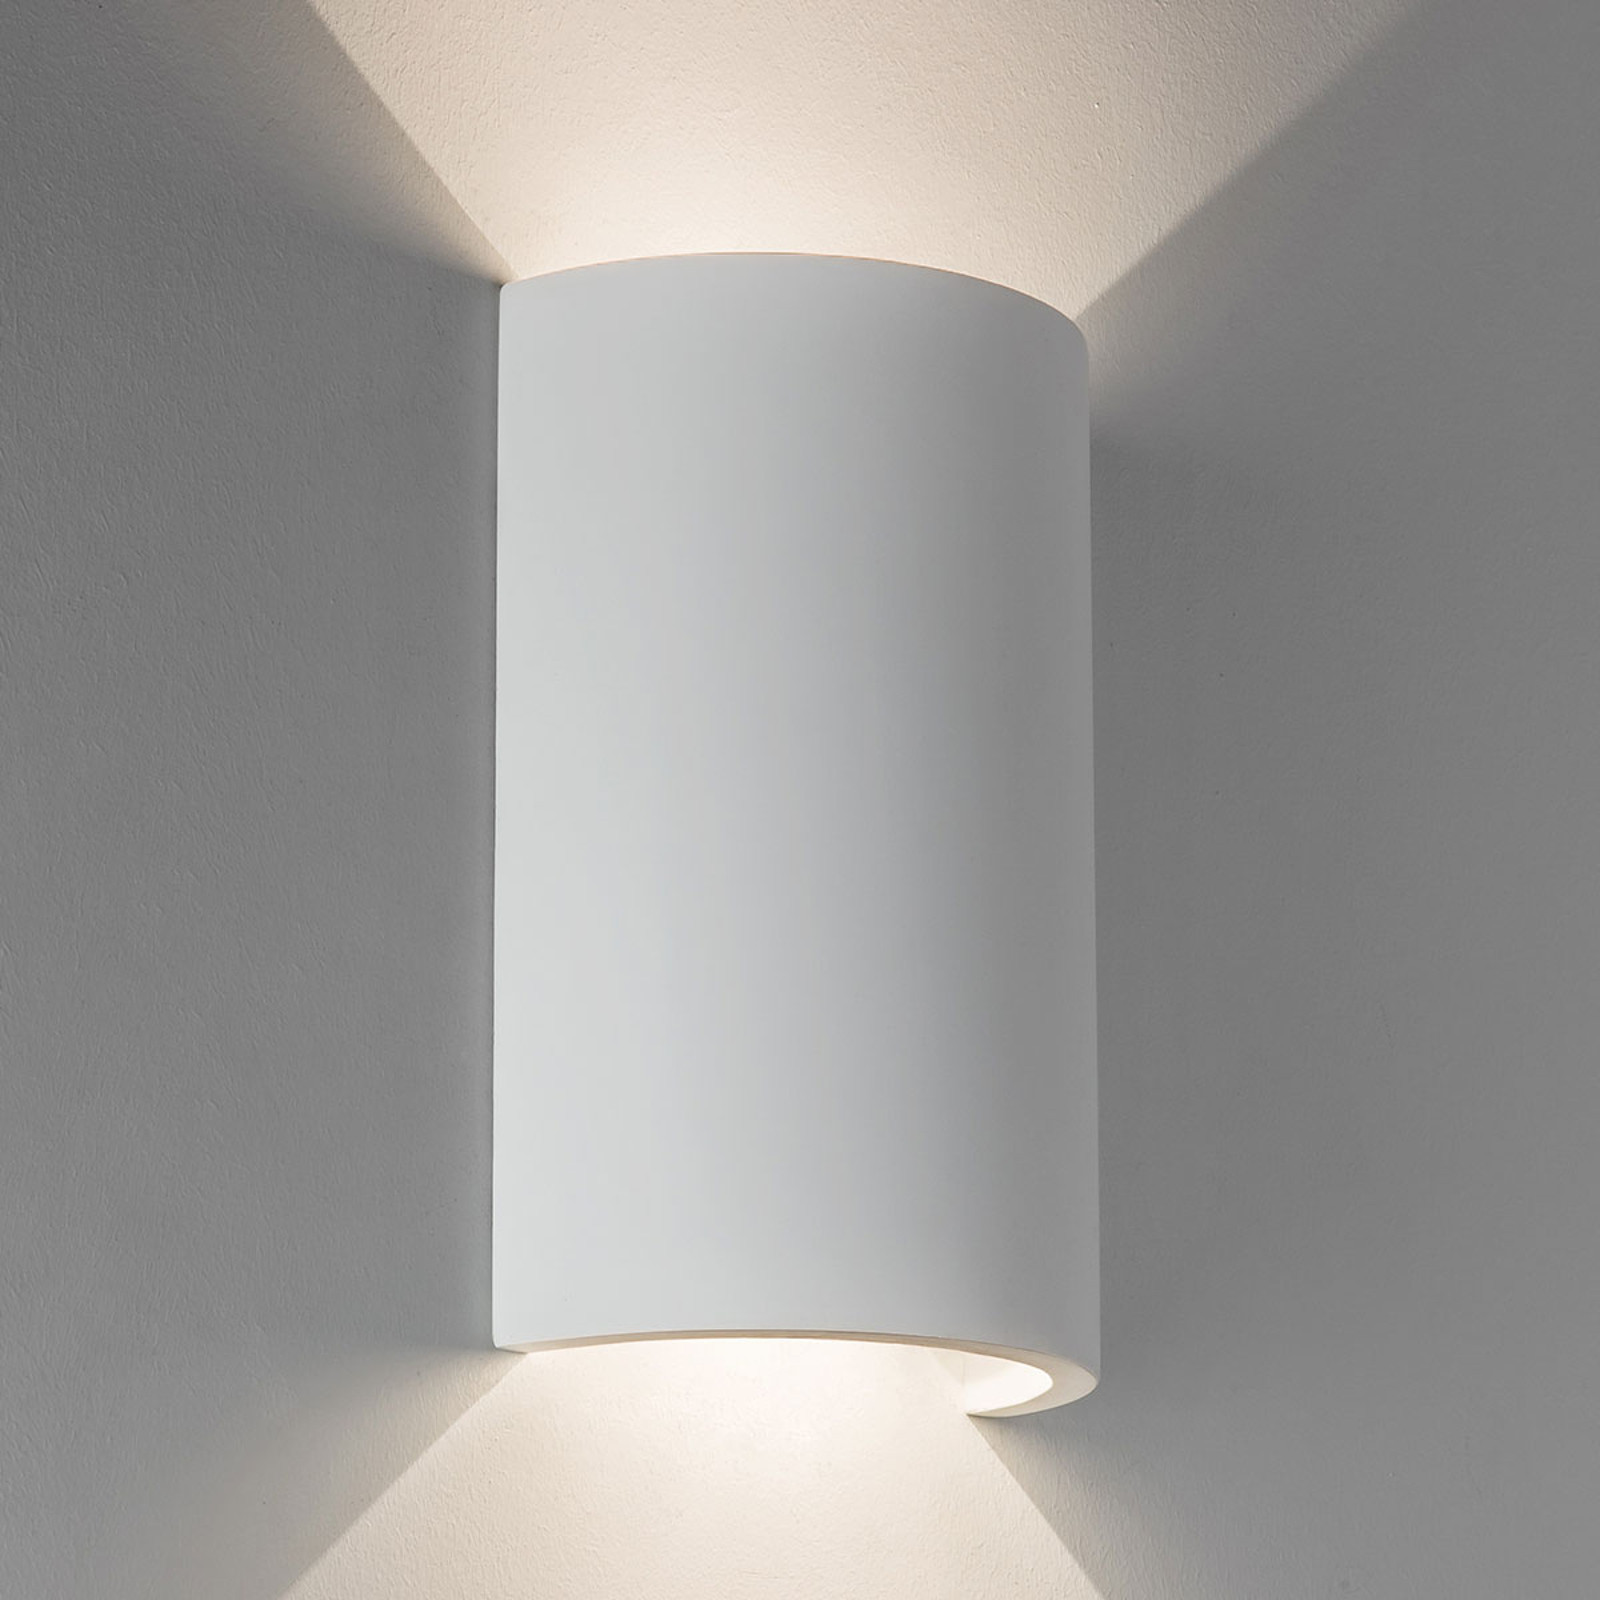 LED-vegglampe Serifos 170 i gips, kan males